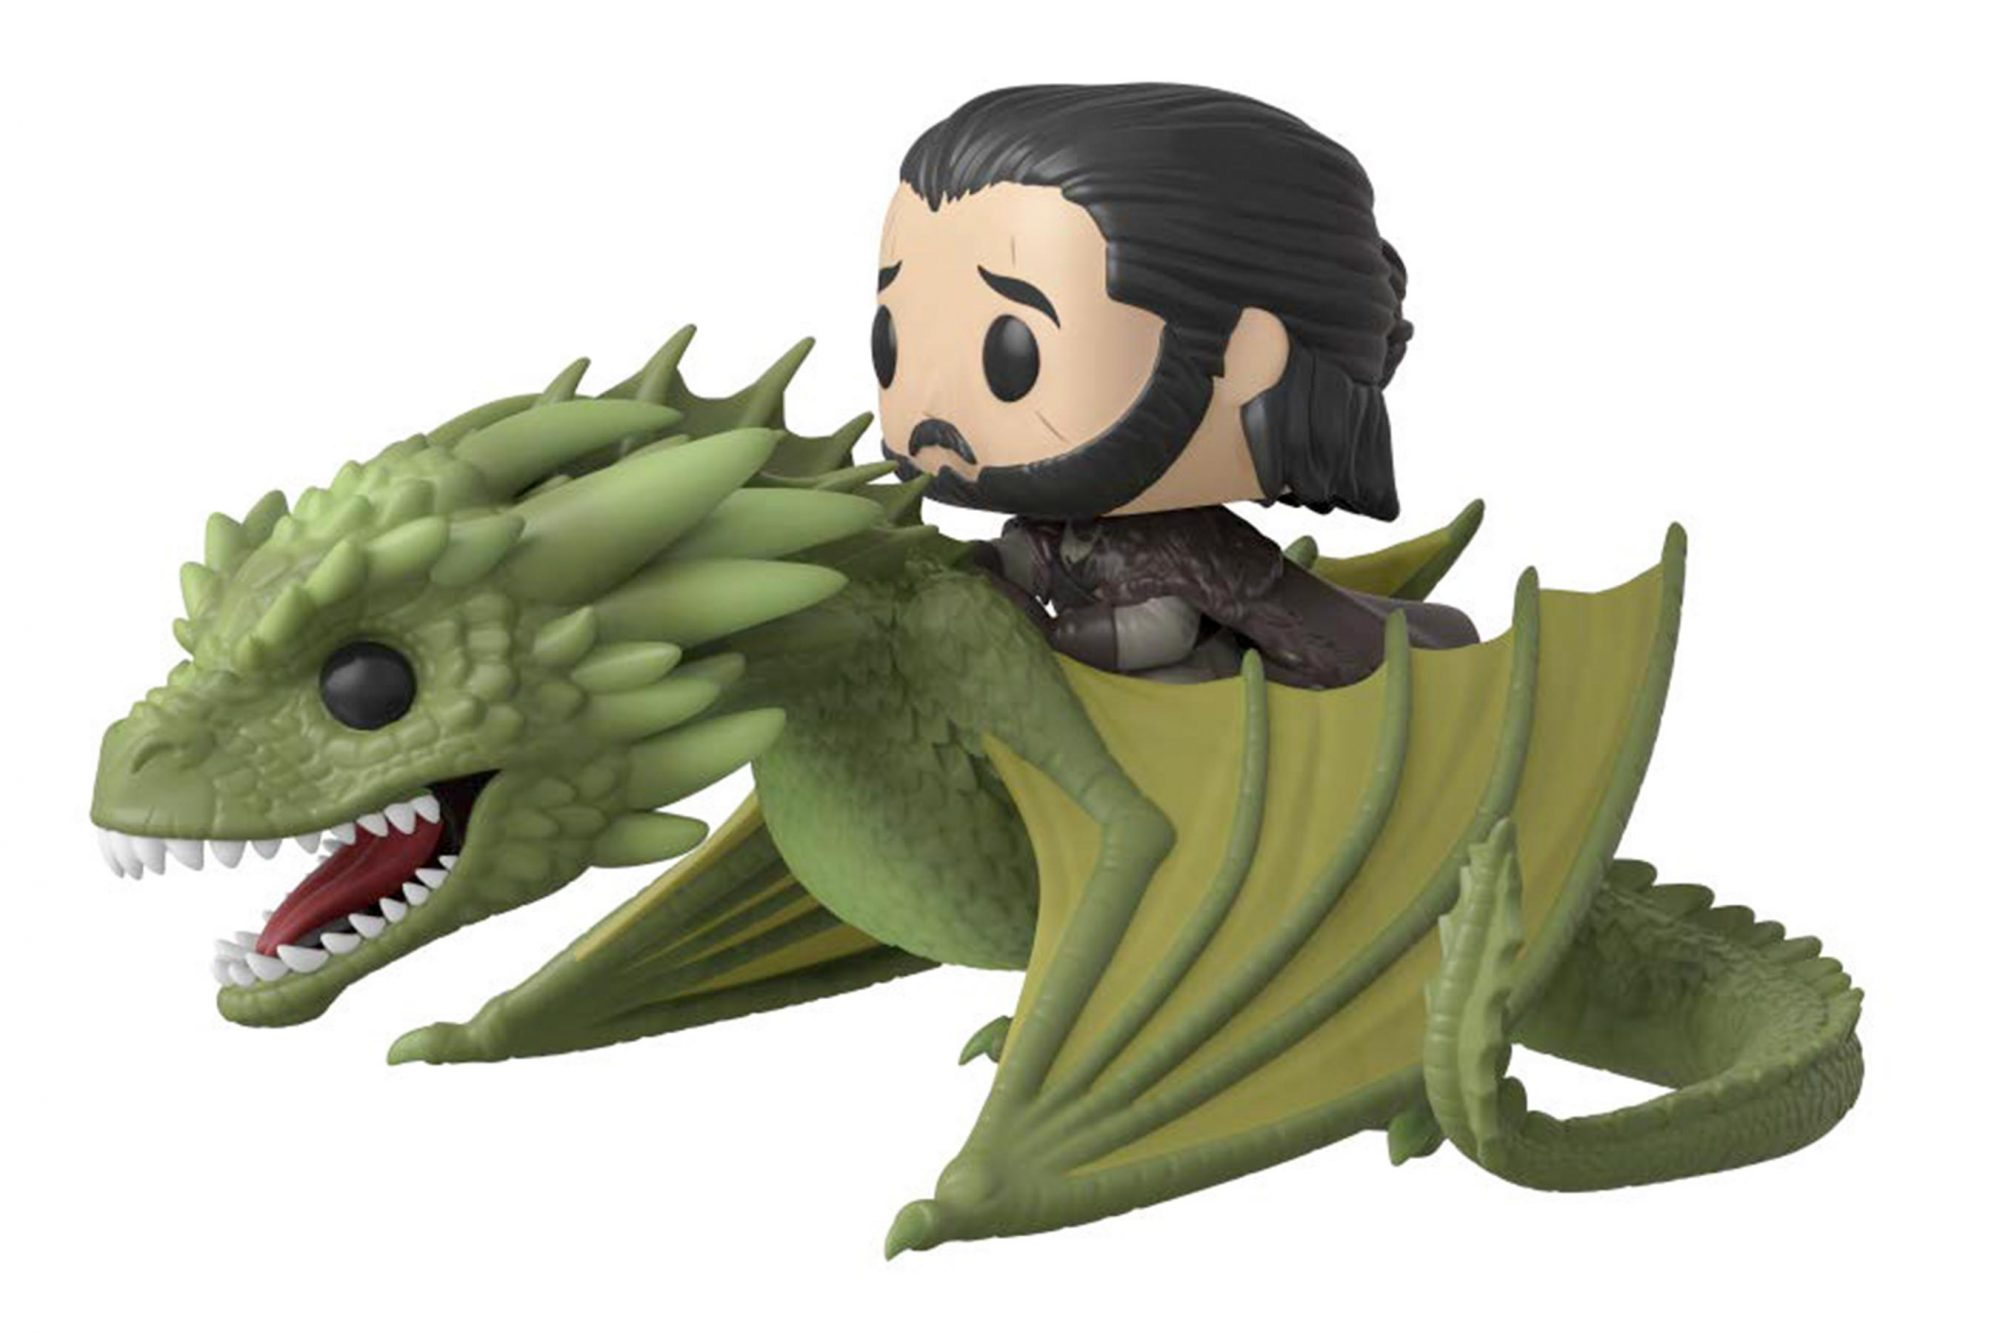 Funko Pop! Rides TV: Game of Thrones, Jon Snow with Rhaegal